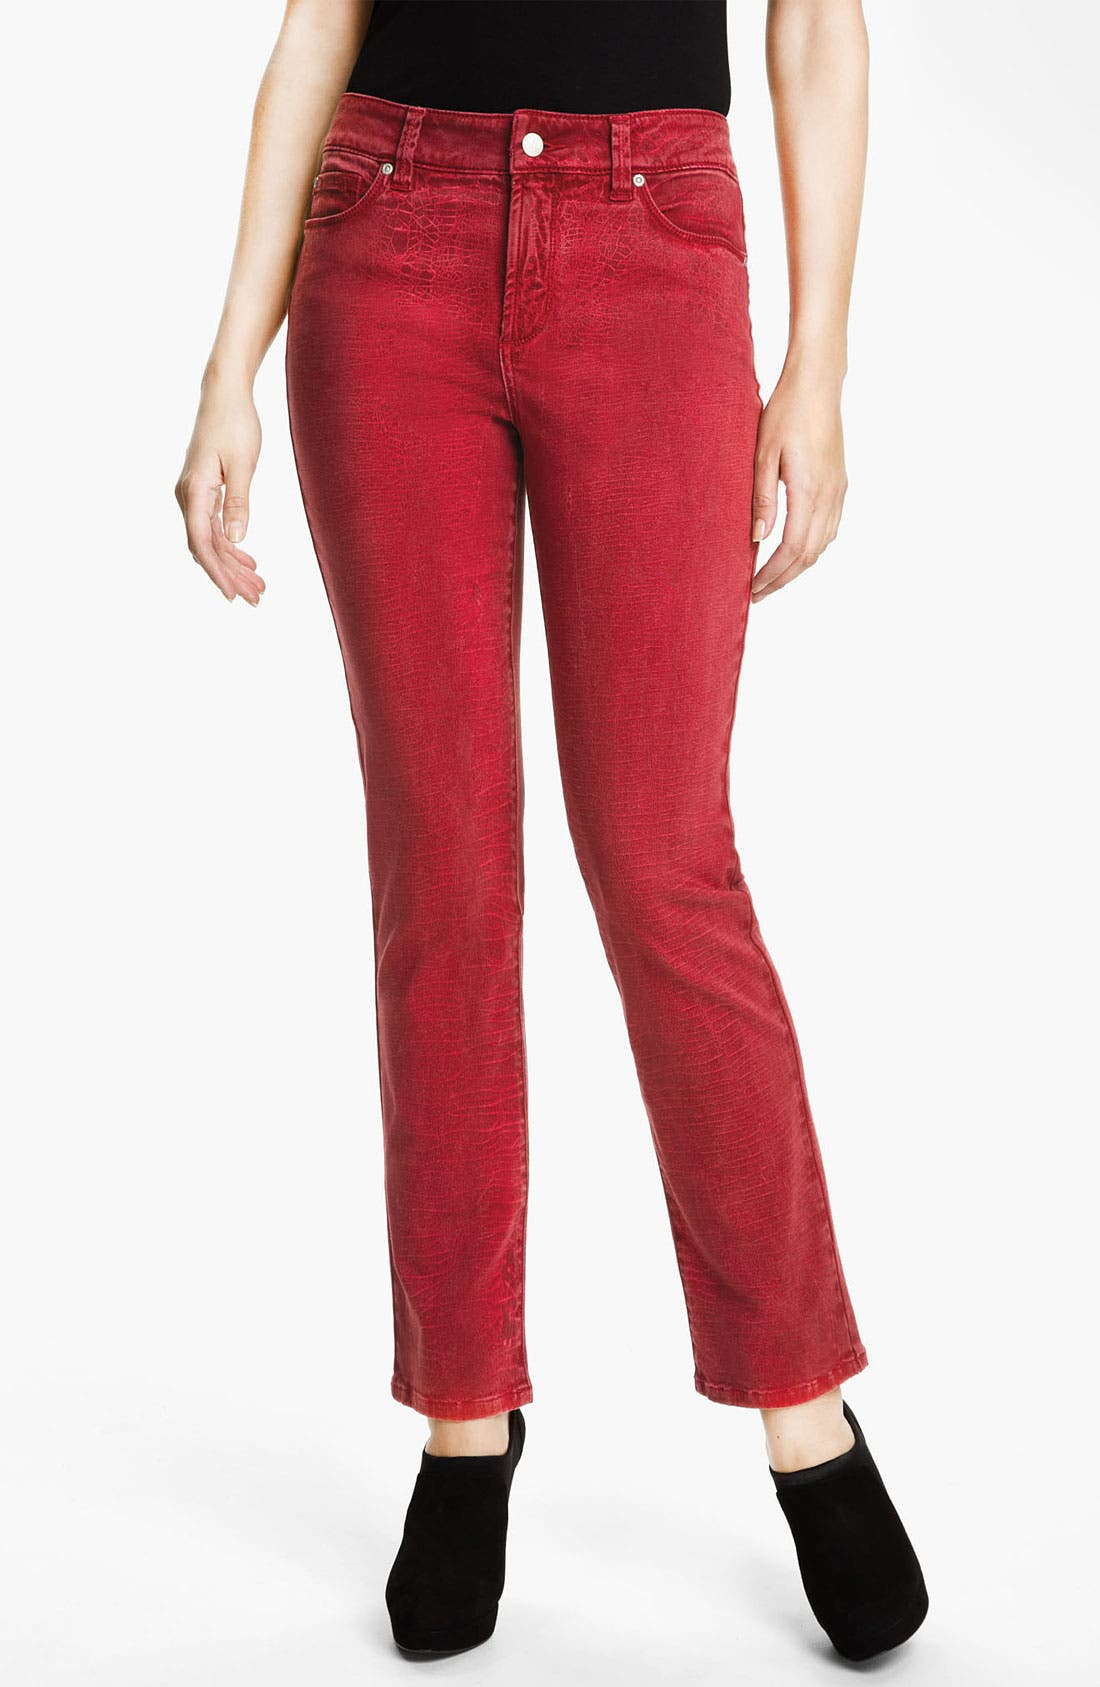 Main Image - NYDJ 'Sheri - Shattered' Print Skinny Twill Jeans